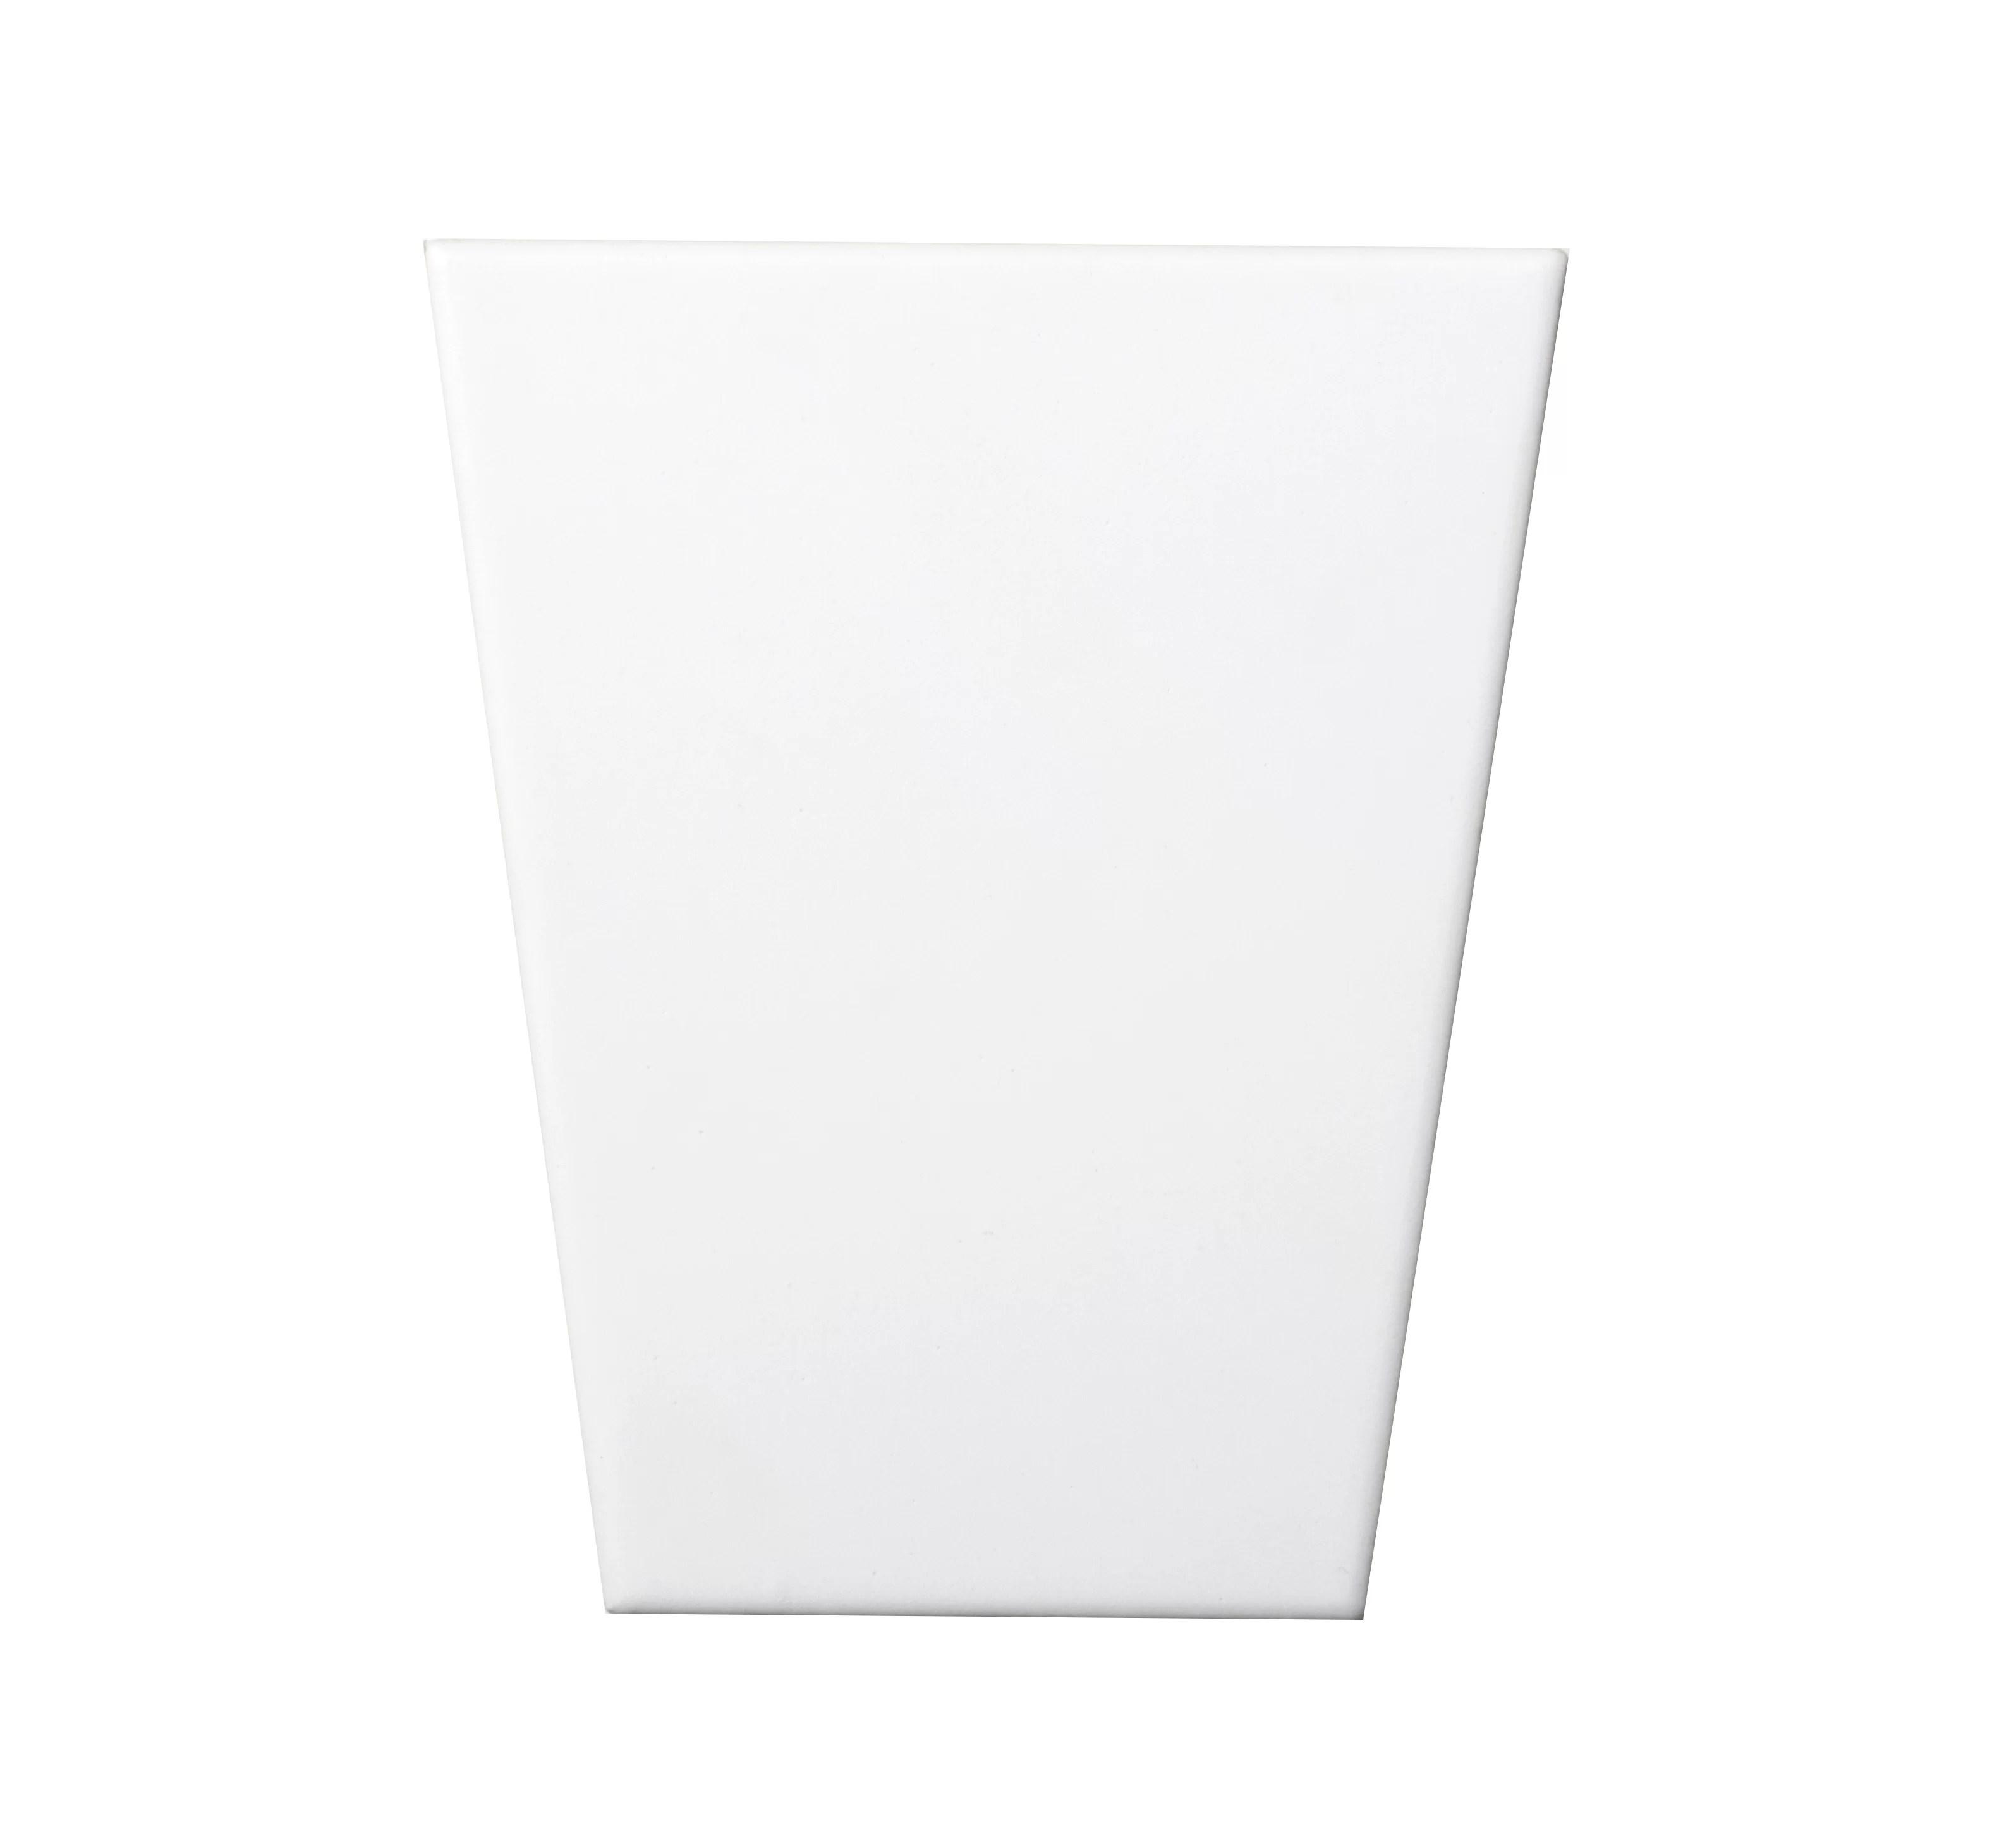 code wedge 3d 5 x 6 ceramic field tile in white